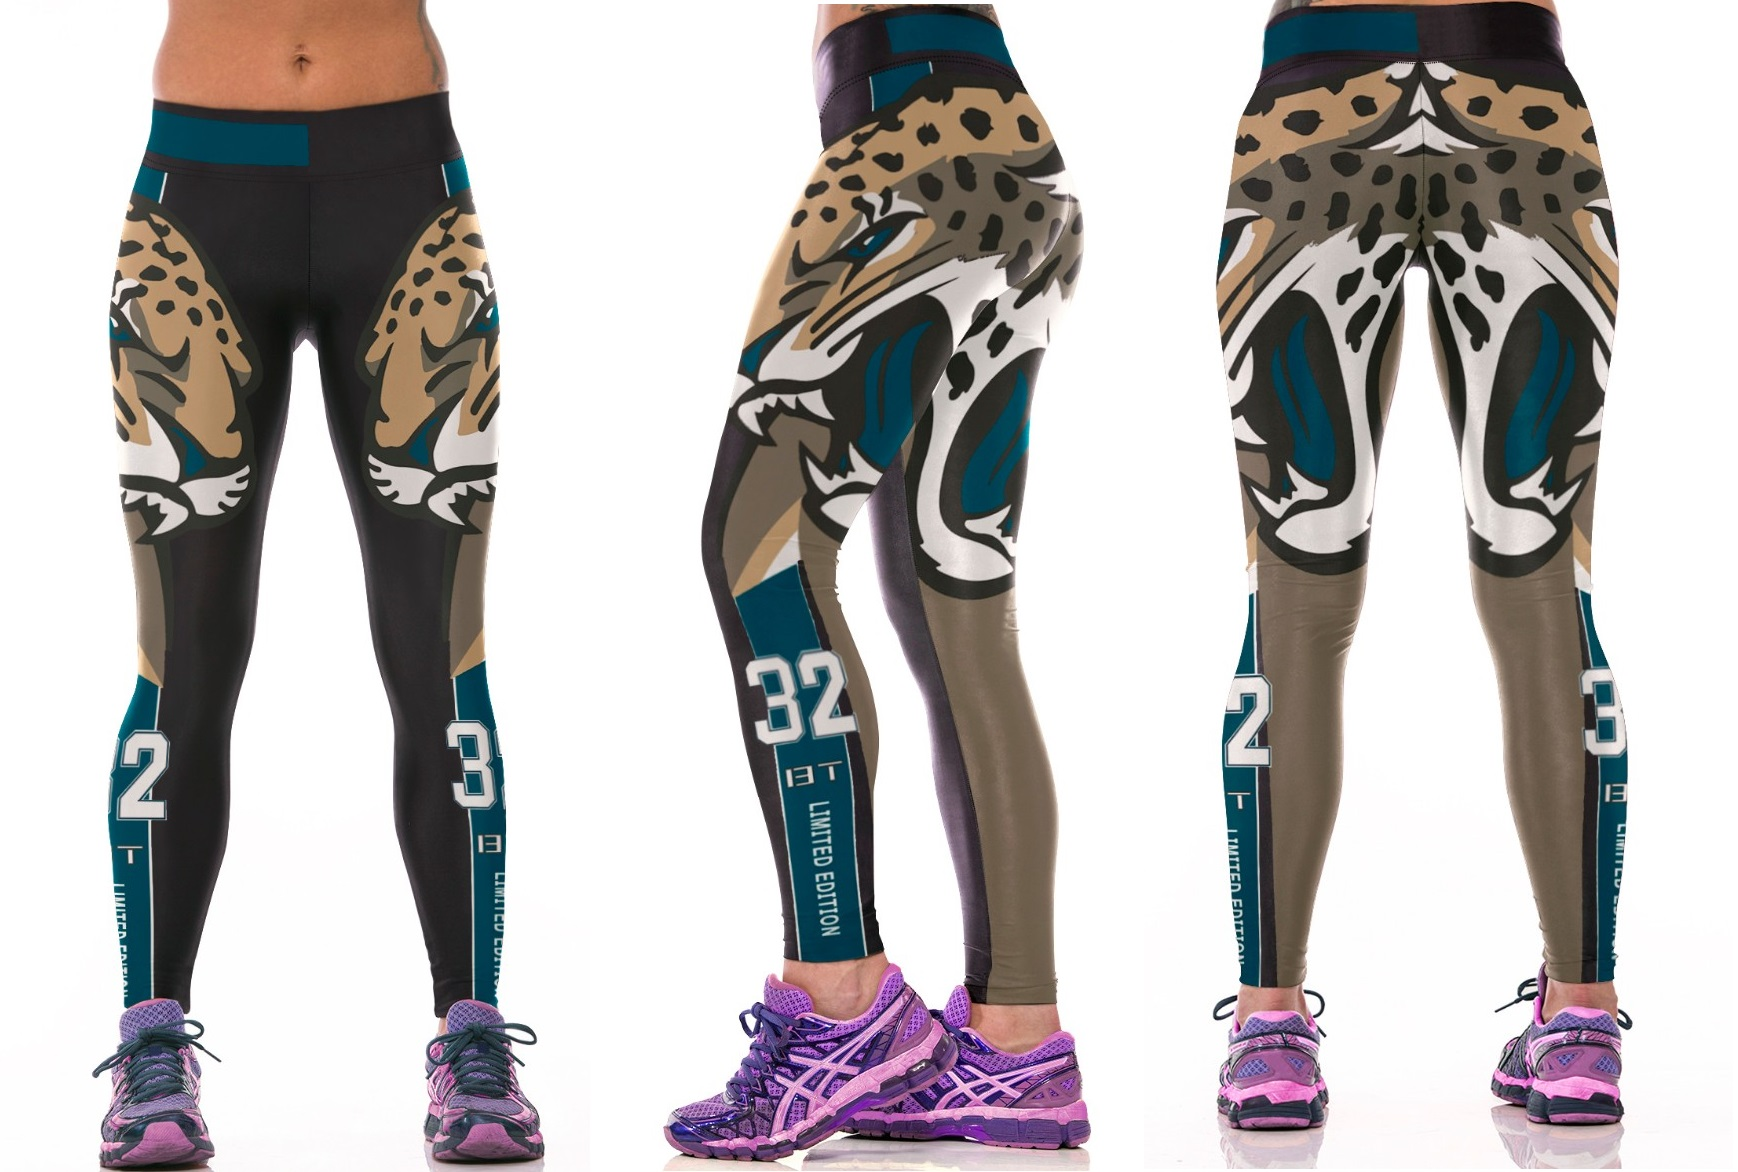 f189dcef Jacksonville Jaguars NFL Sexy Women Leggings Fitness Sports Gym